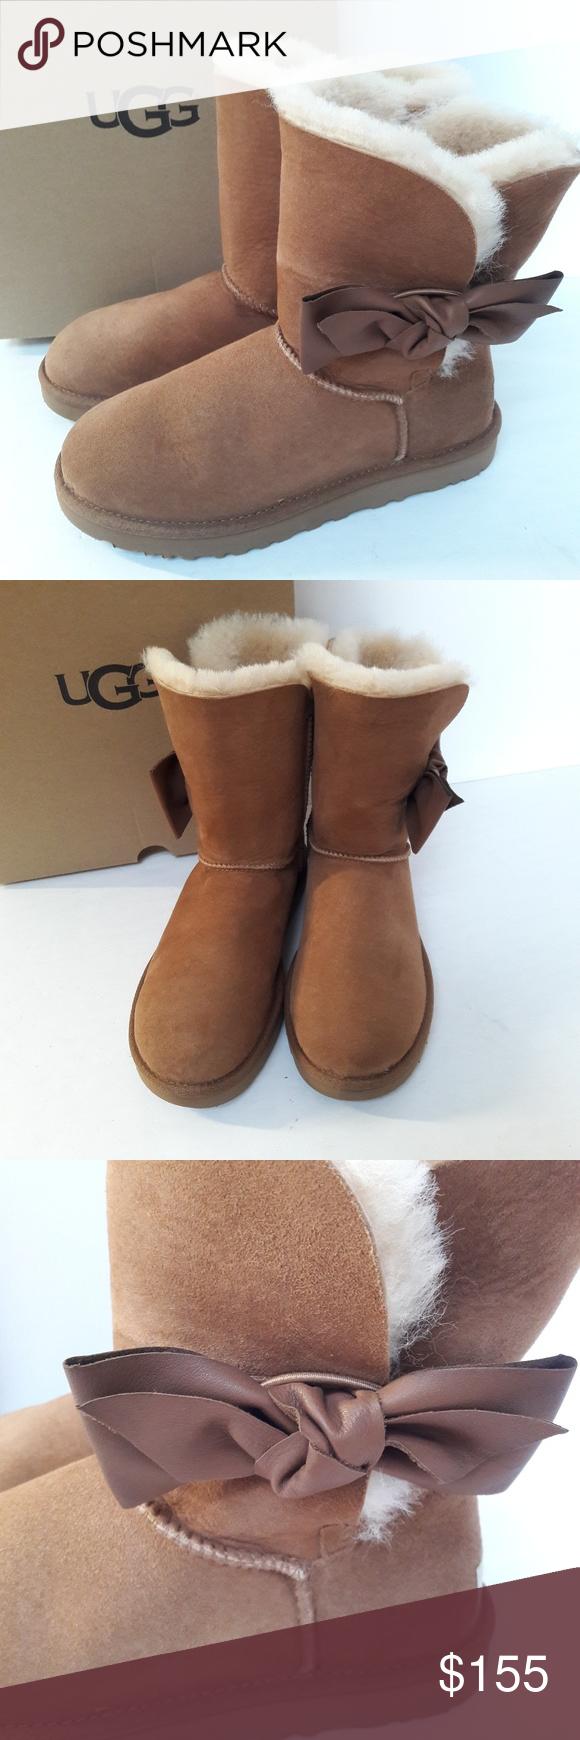 92633342d53 New Chestnut UGG boots Size 7 NWOB Daelyn UGG Boots in Chestnut ...